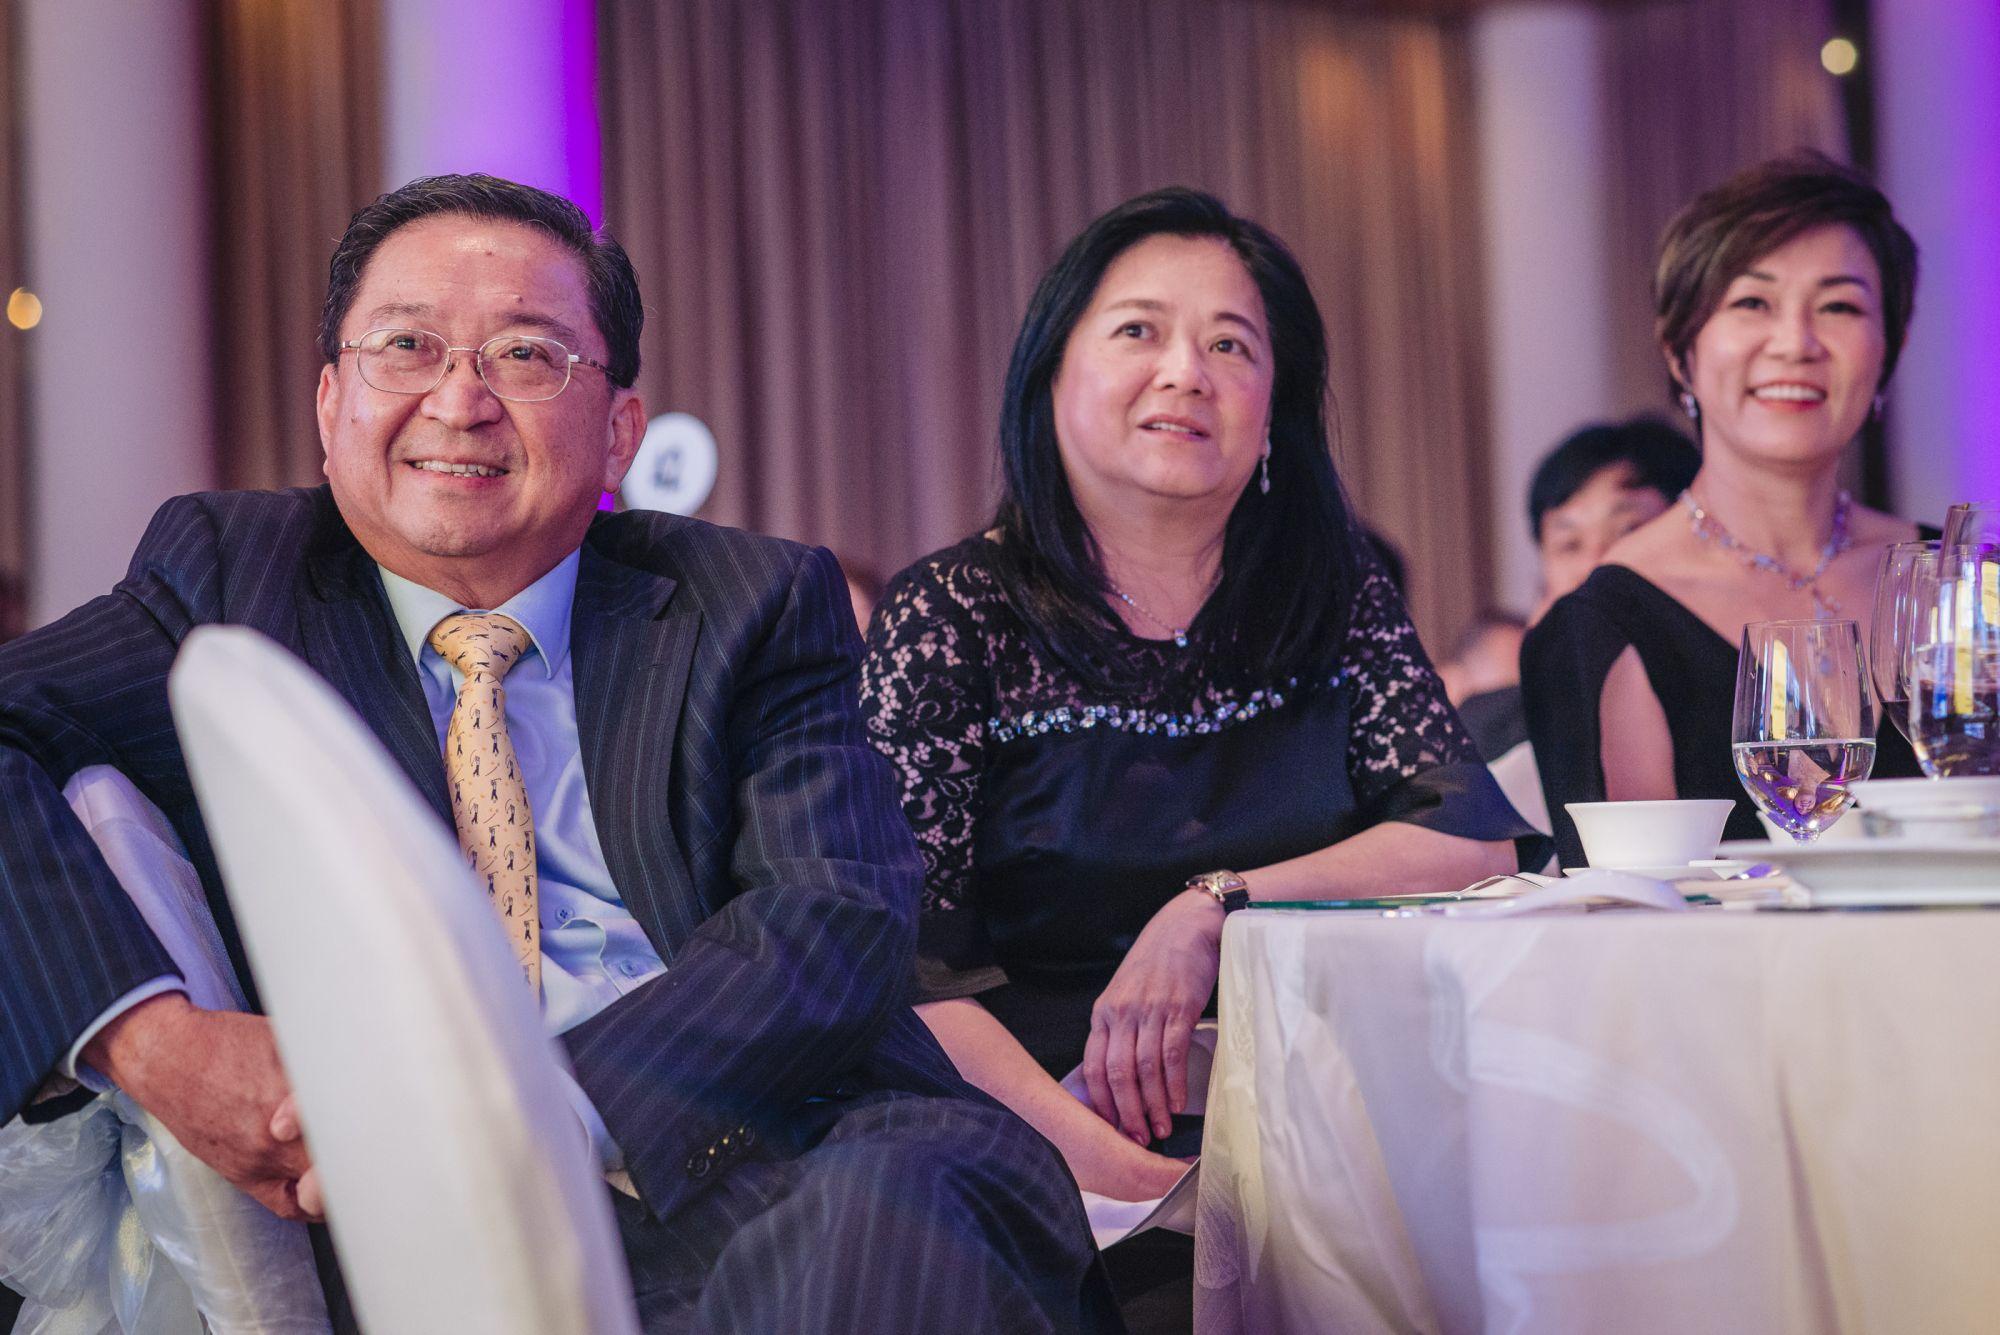 John Lim, Loh Hee Hiang, Emily Neo